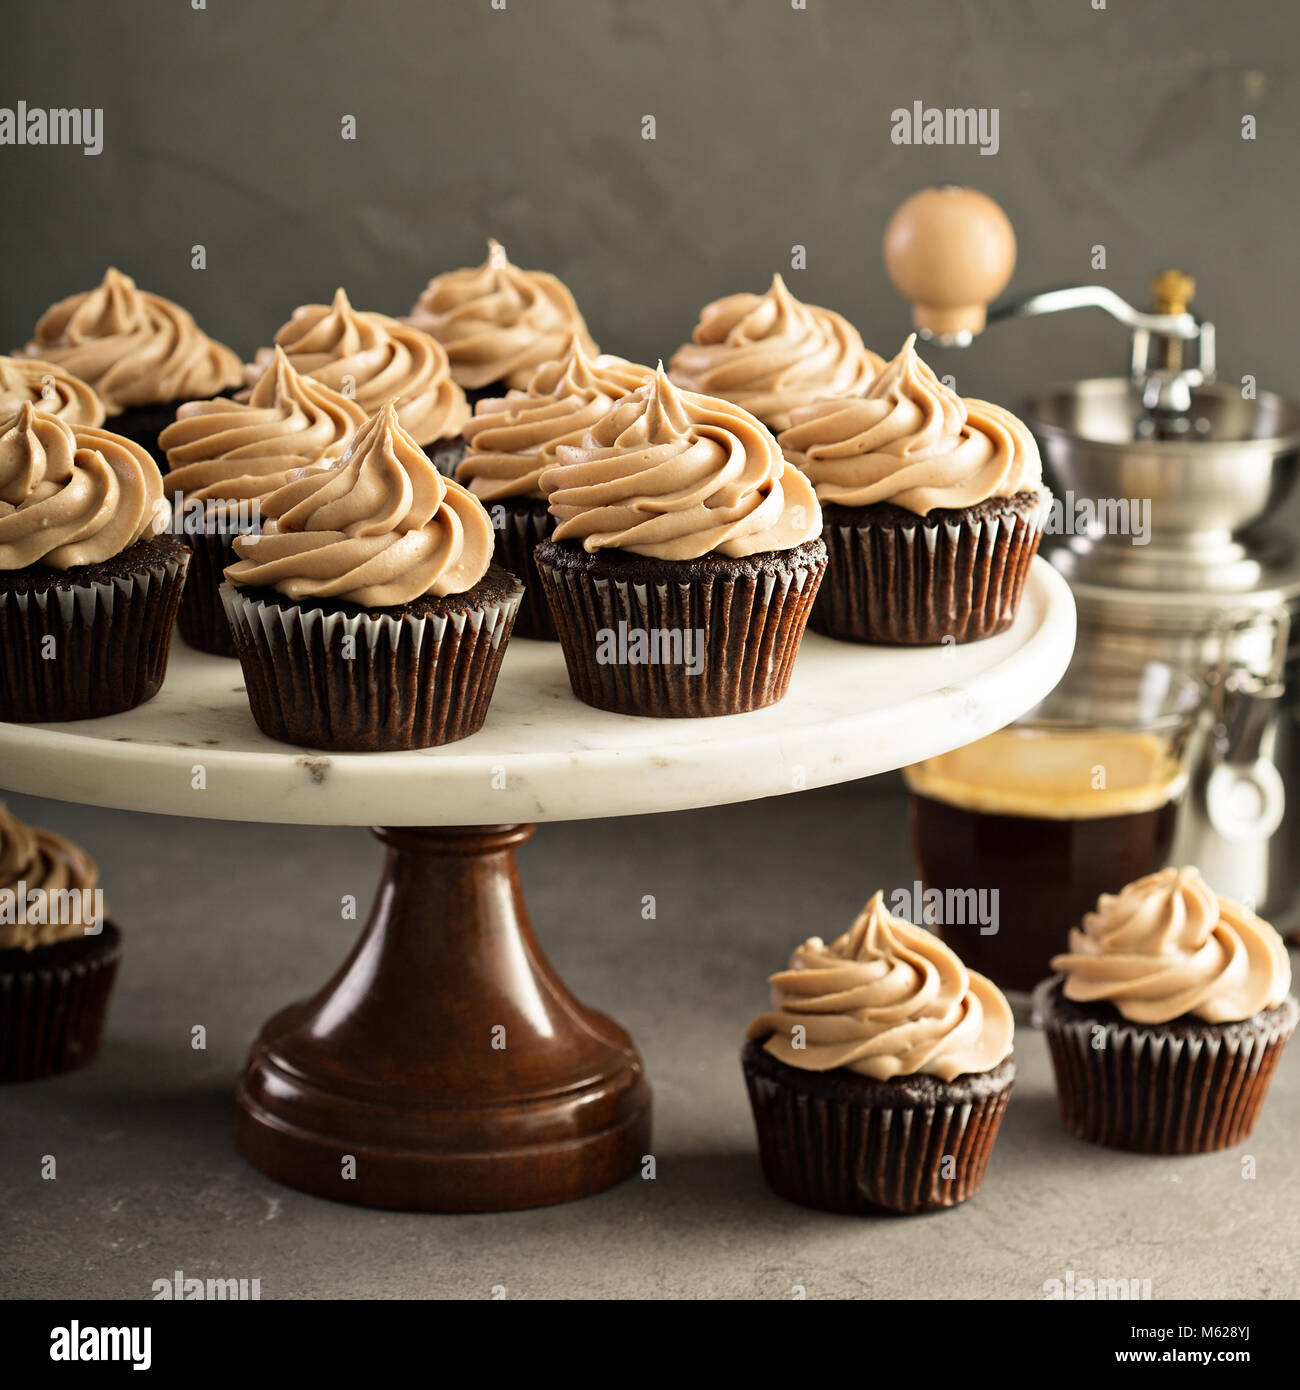 Schokolade espresso Muffins Stockbild